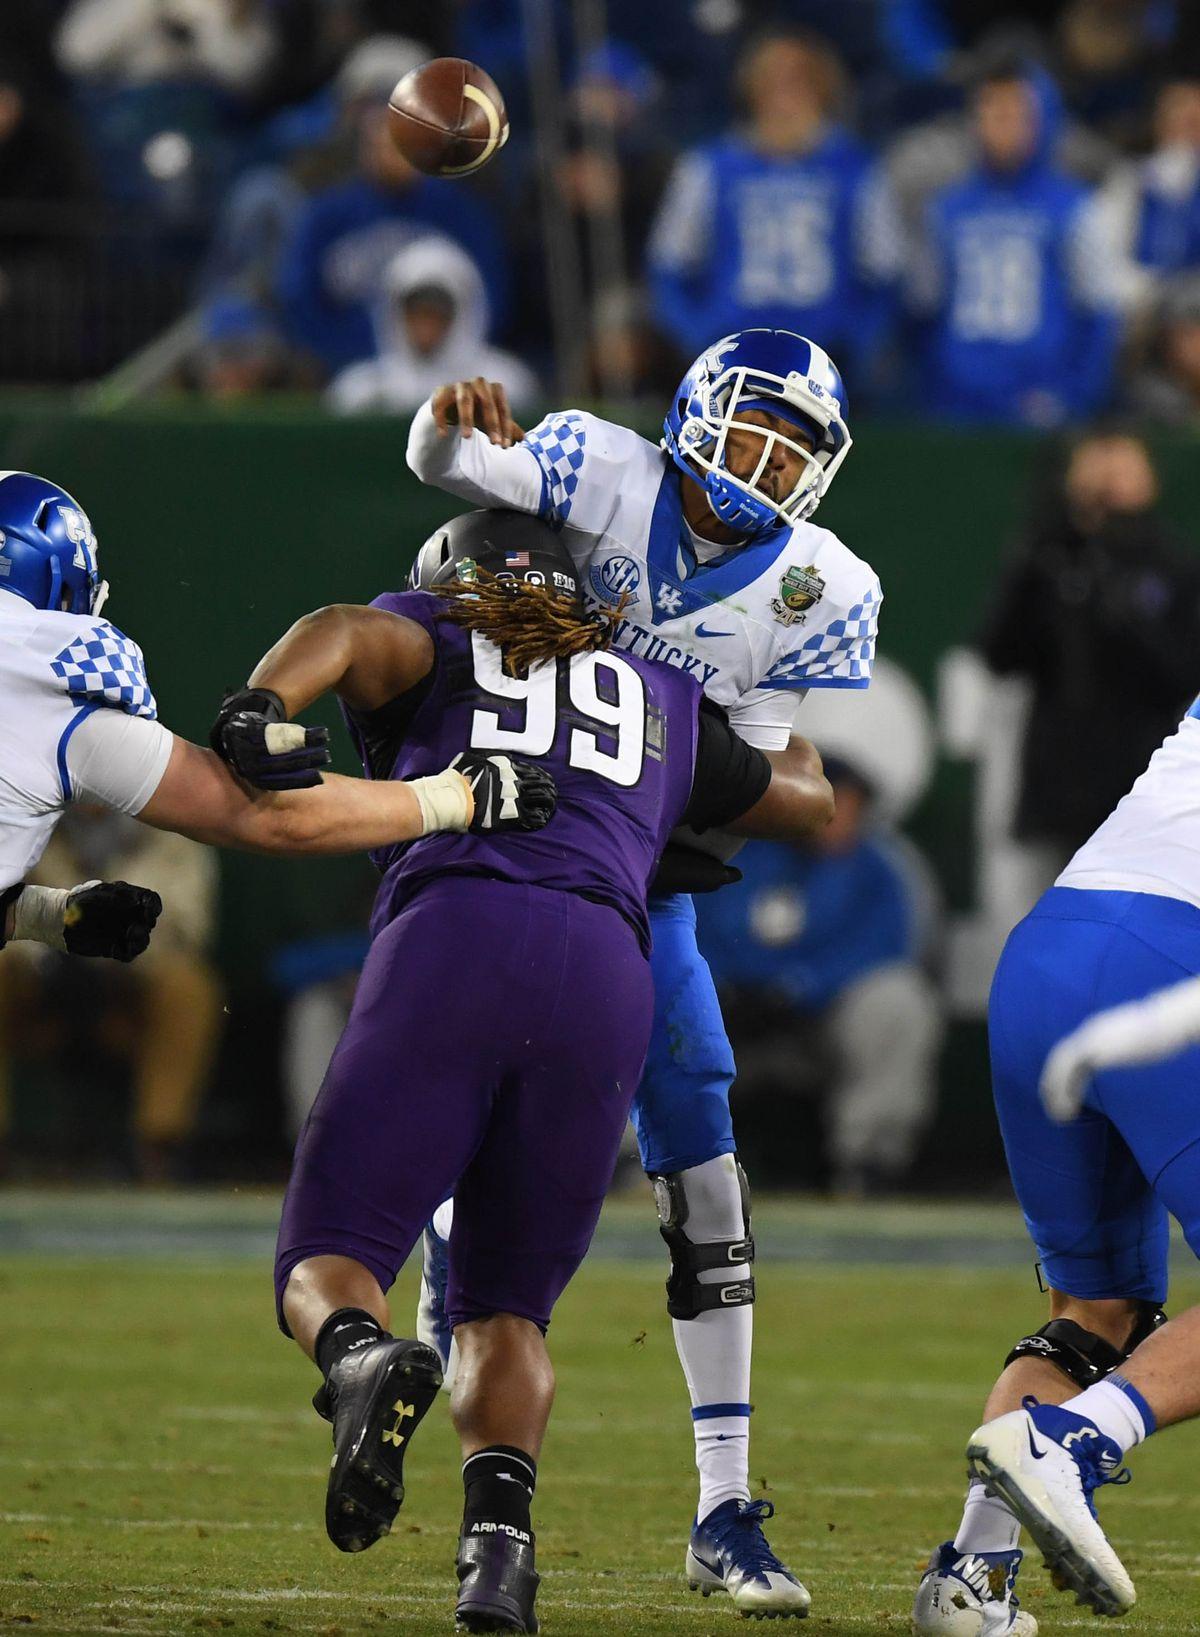 NCAA Football: Music Bowl-Kentucky vs Northwestern